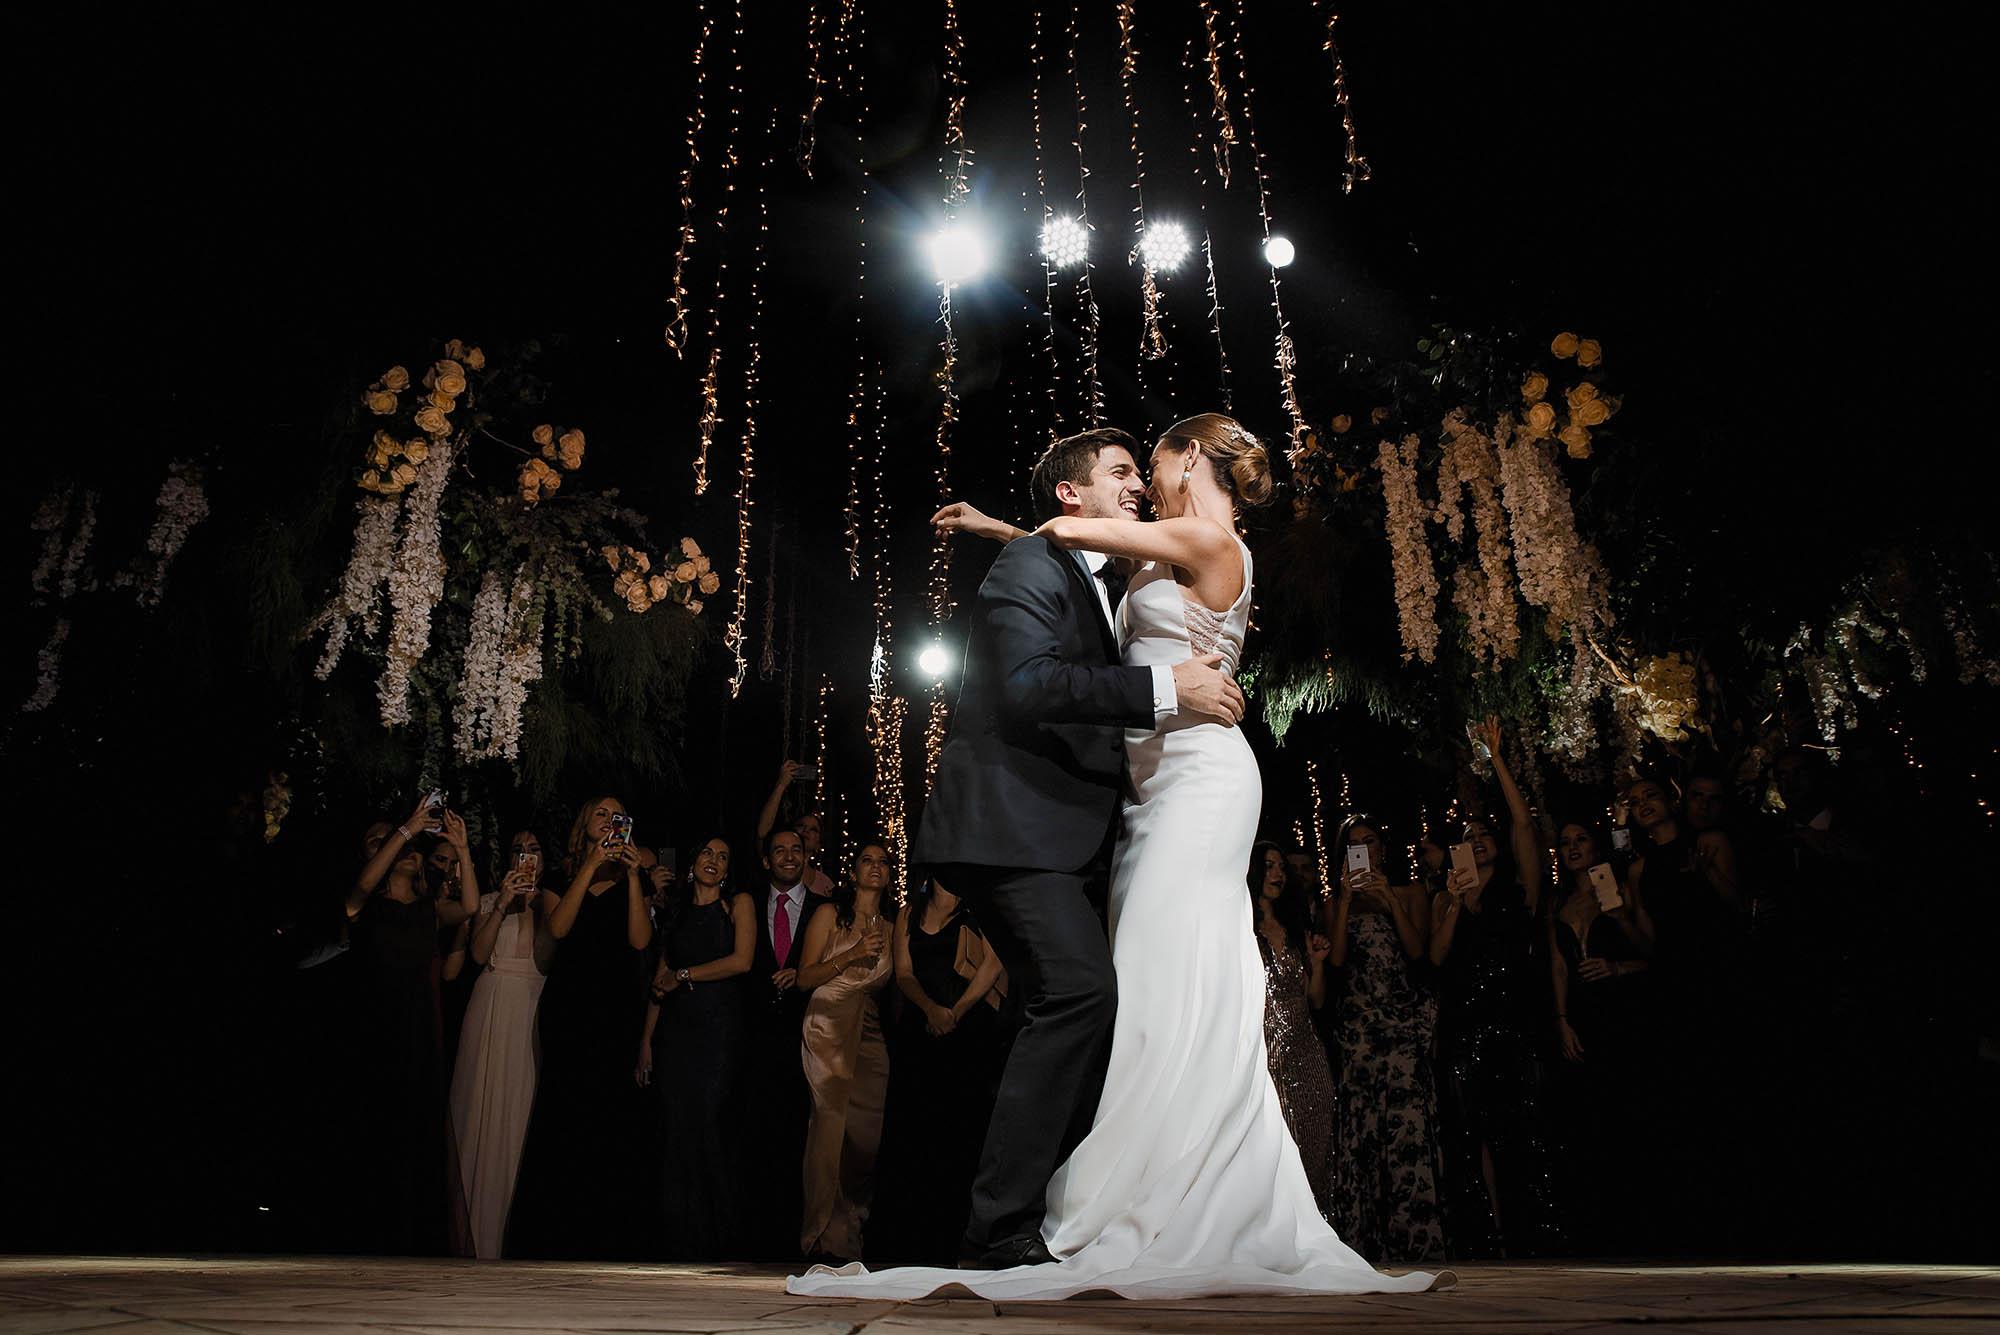 magali fotografo hacienda escoba guadalajara boda wedding 29.jpg